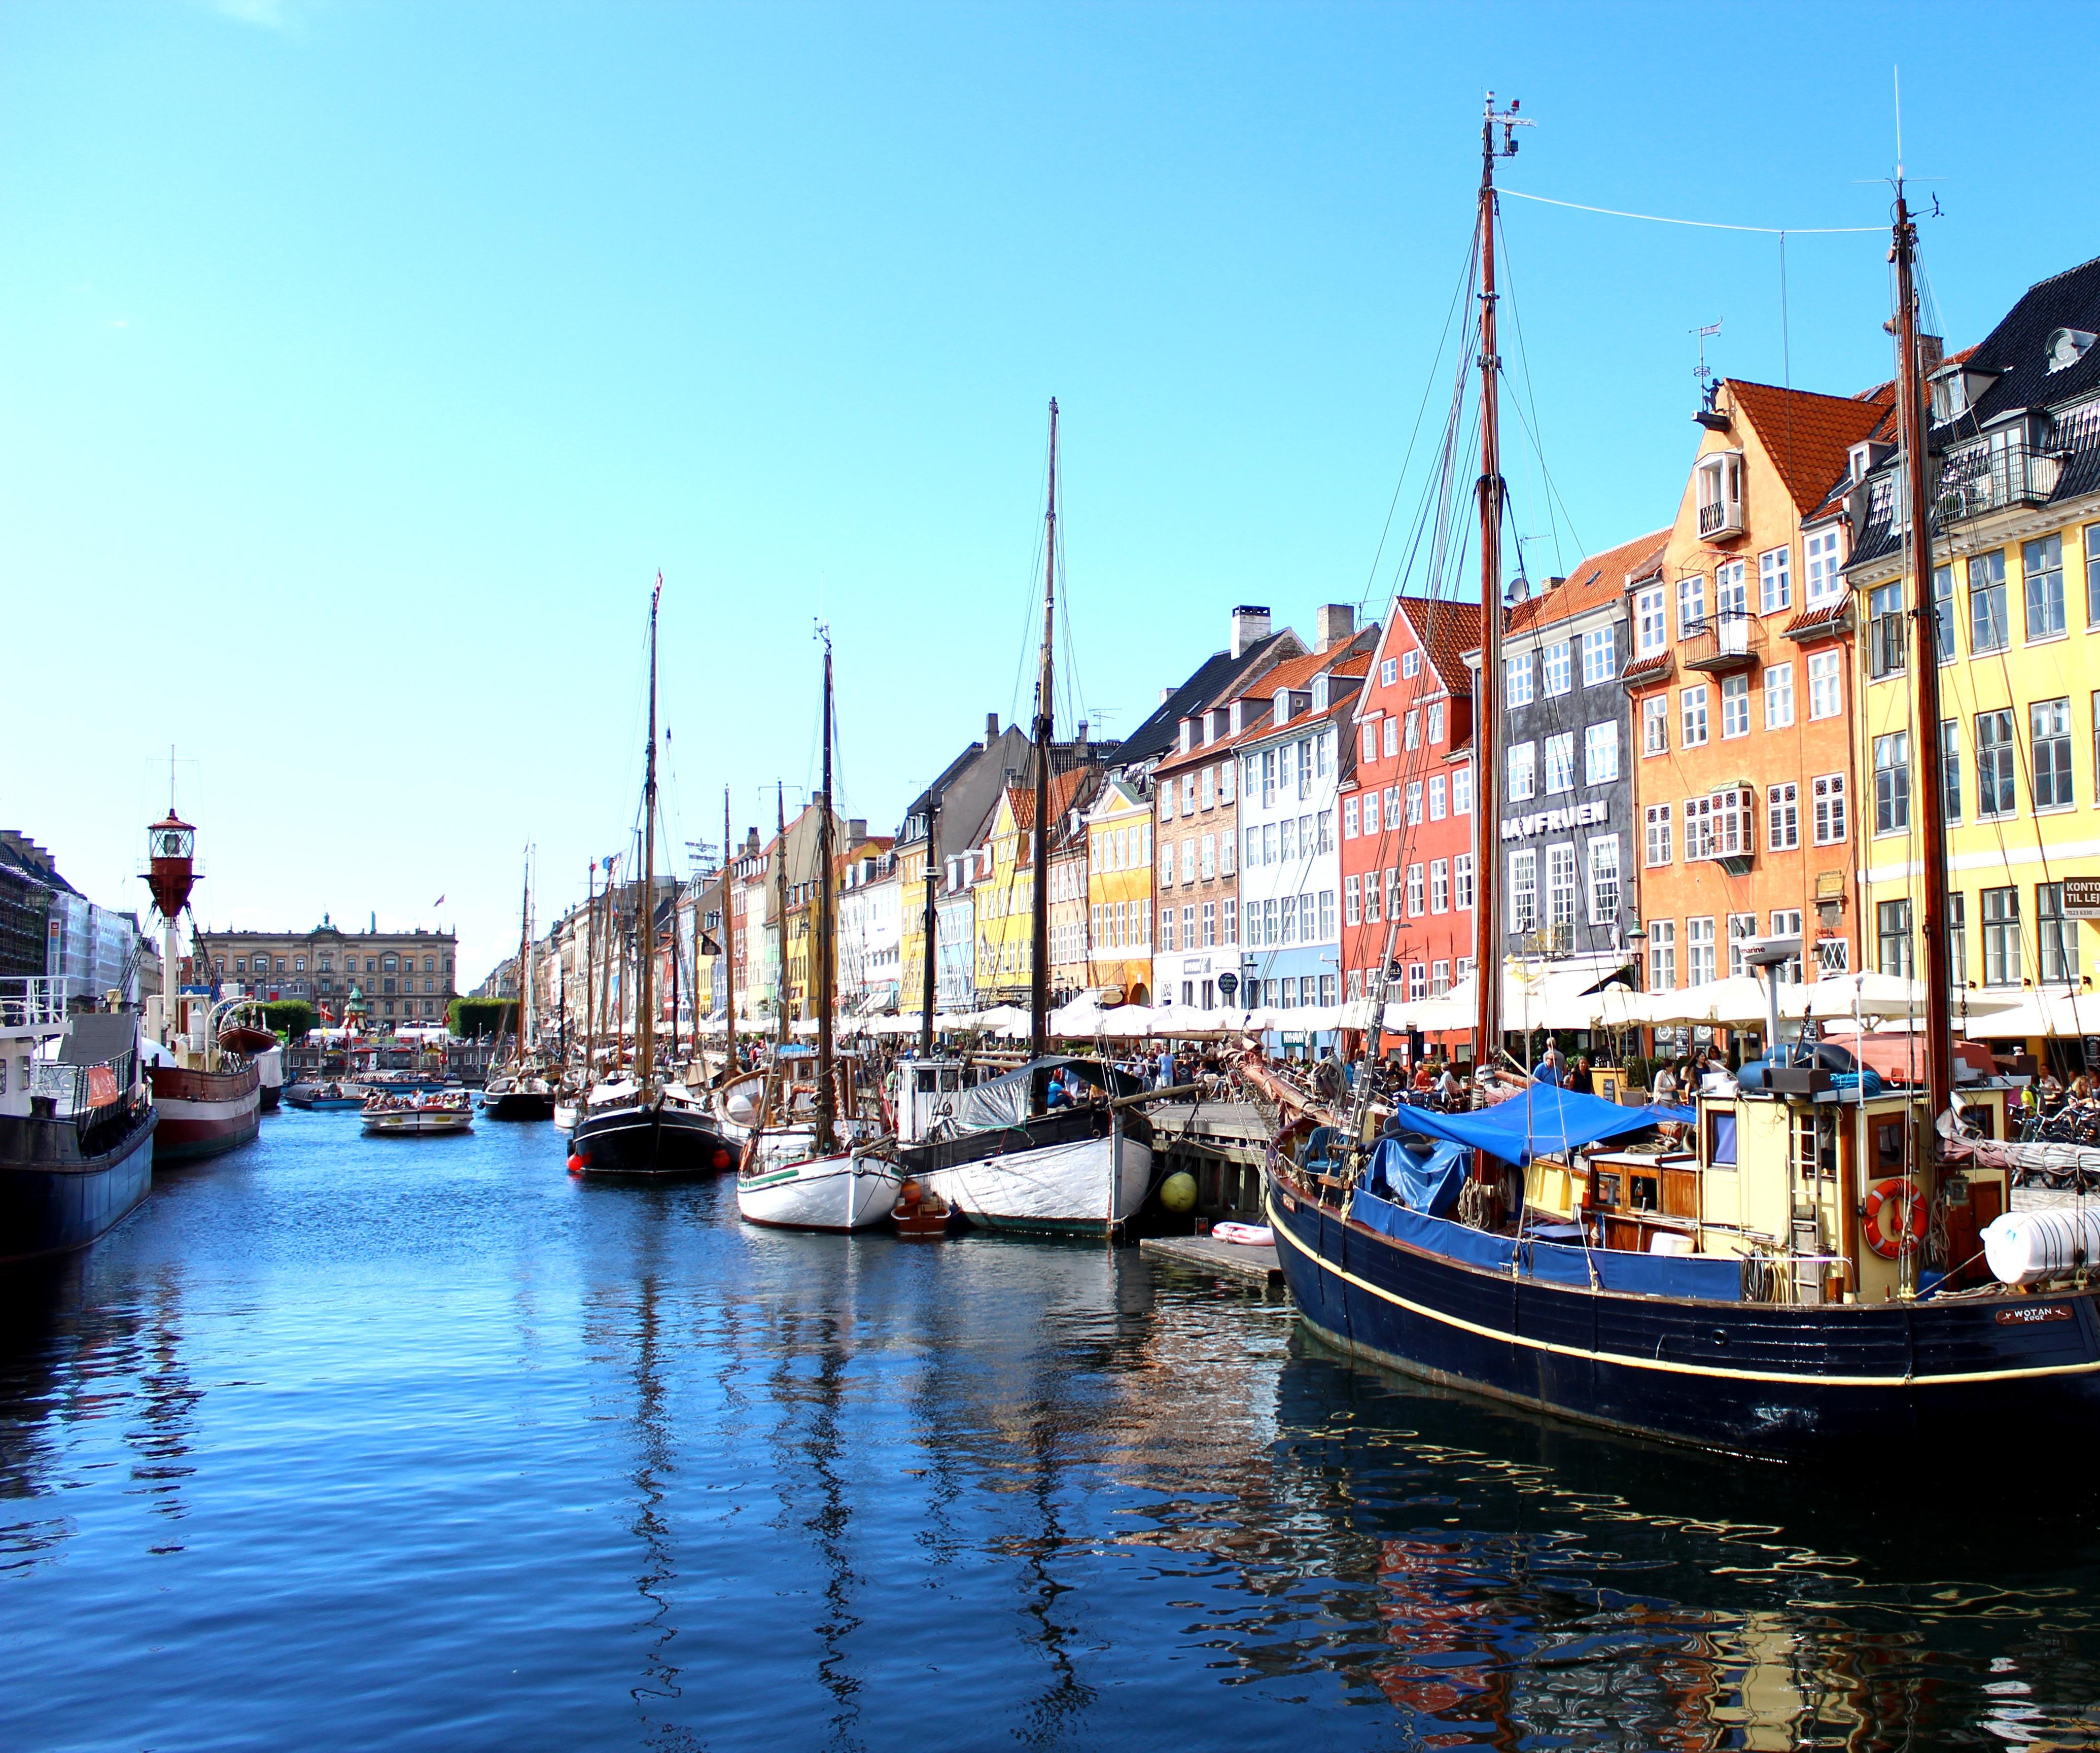 Kostenlose foto : Landschaft, Meer, Wasser, Himmel, Boot, Stadt ...